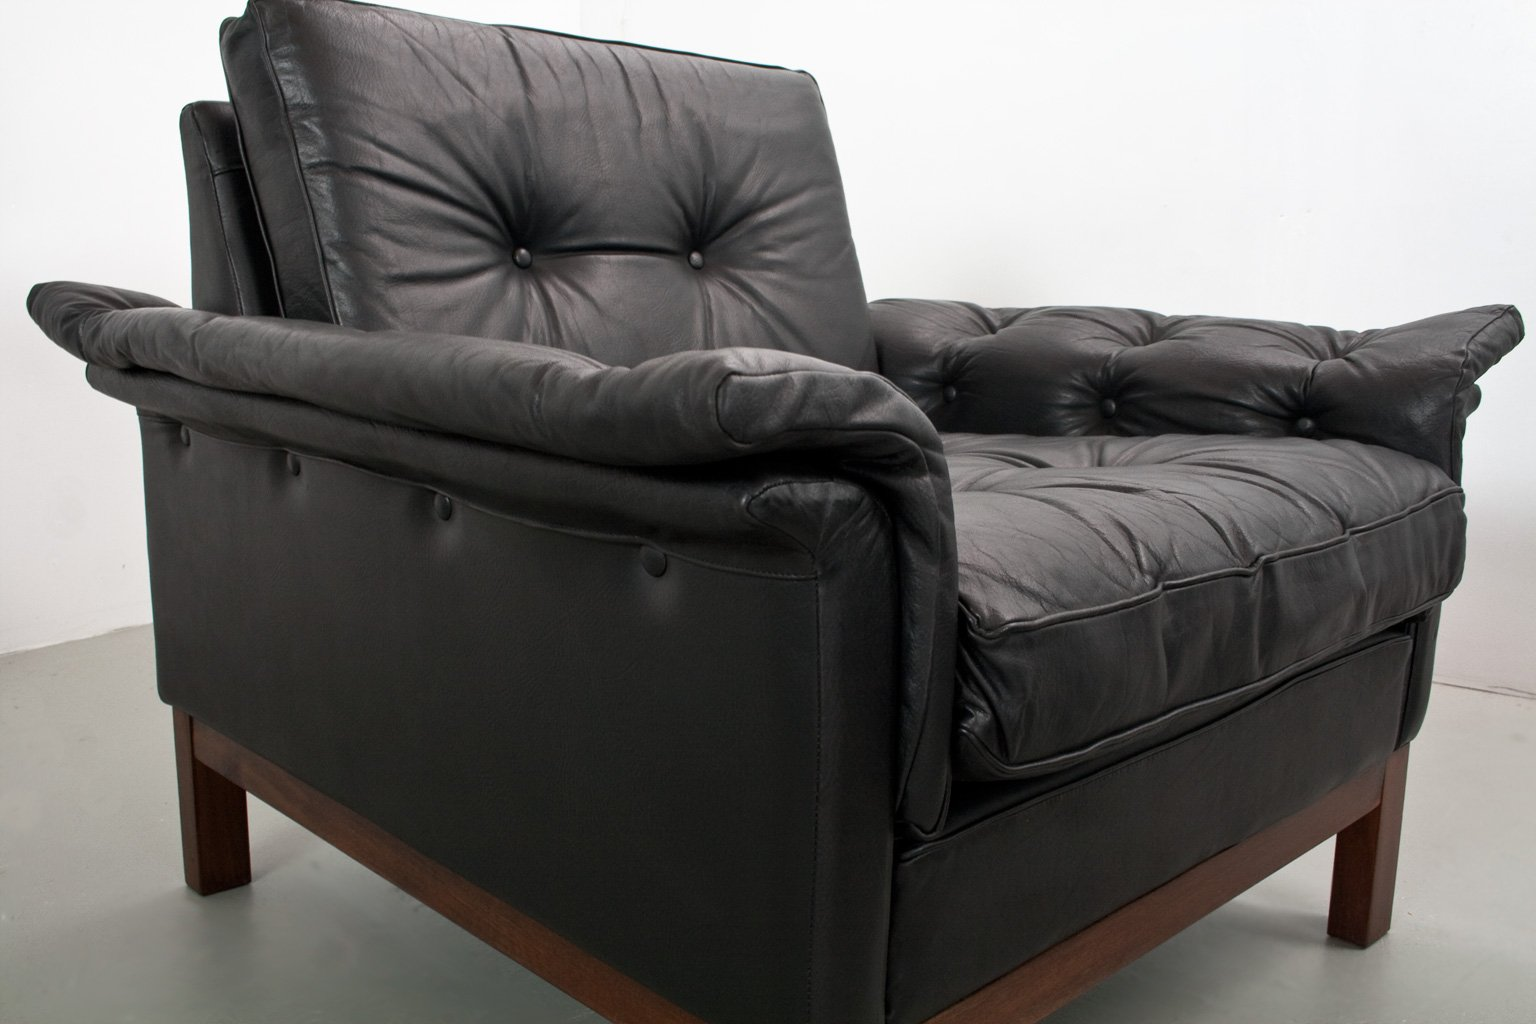 skandinavische mid century leder sessel 1950er 2er set bei pamono kaufen. Black Bedroom Furniture Sets. Home Design Ideas